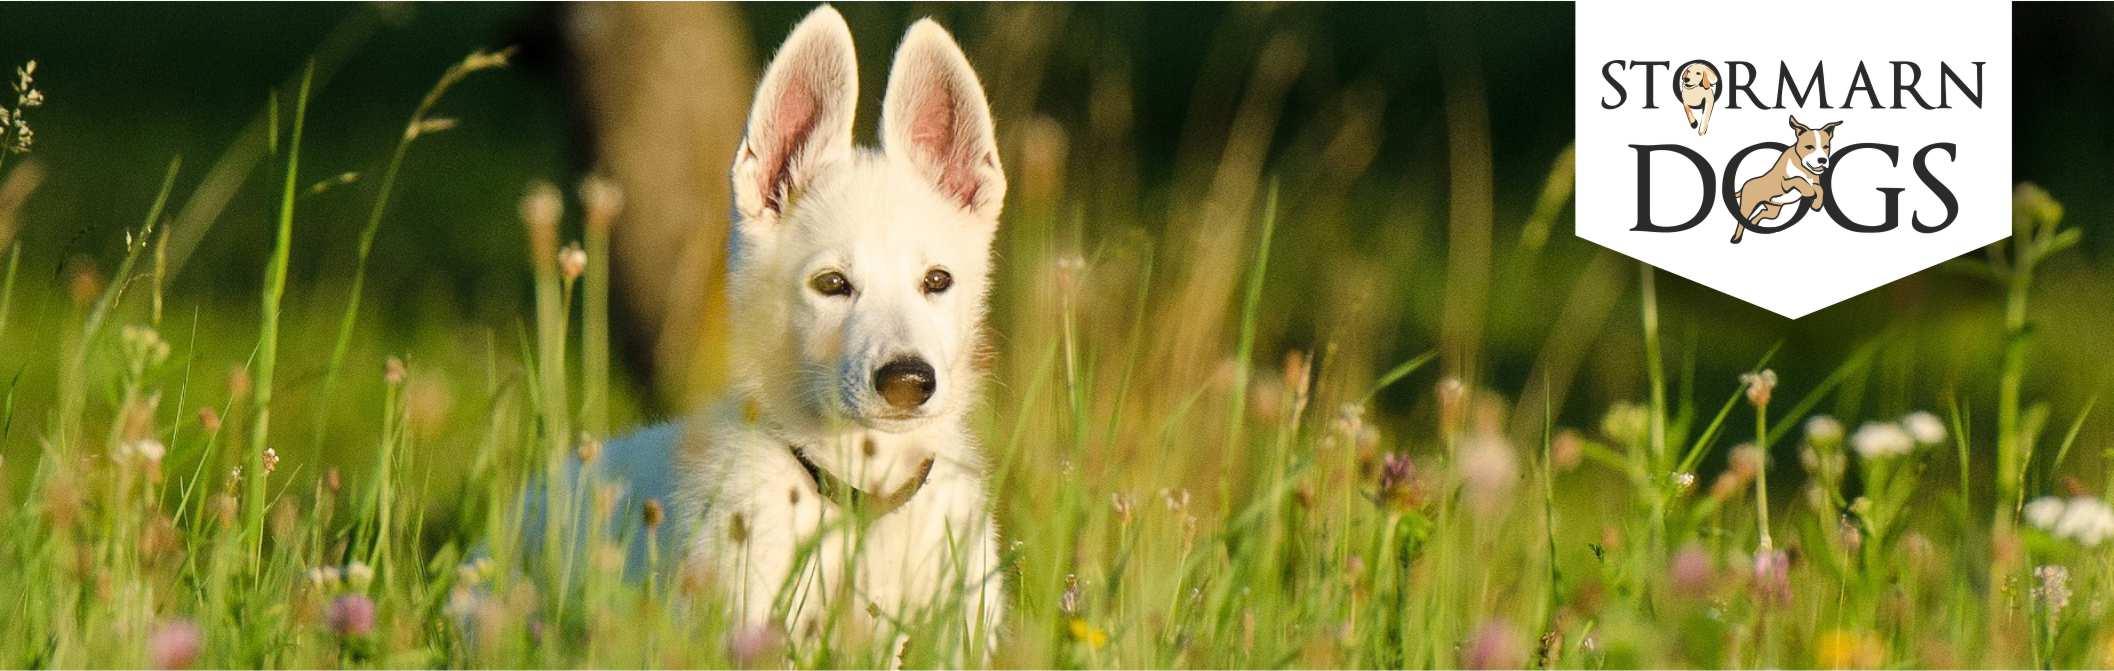 Hundeschule Stormarn Dogs Ammersbek